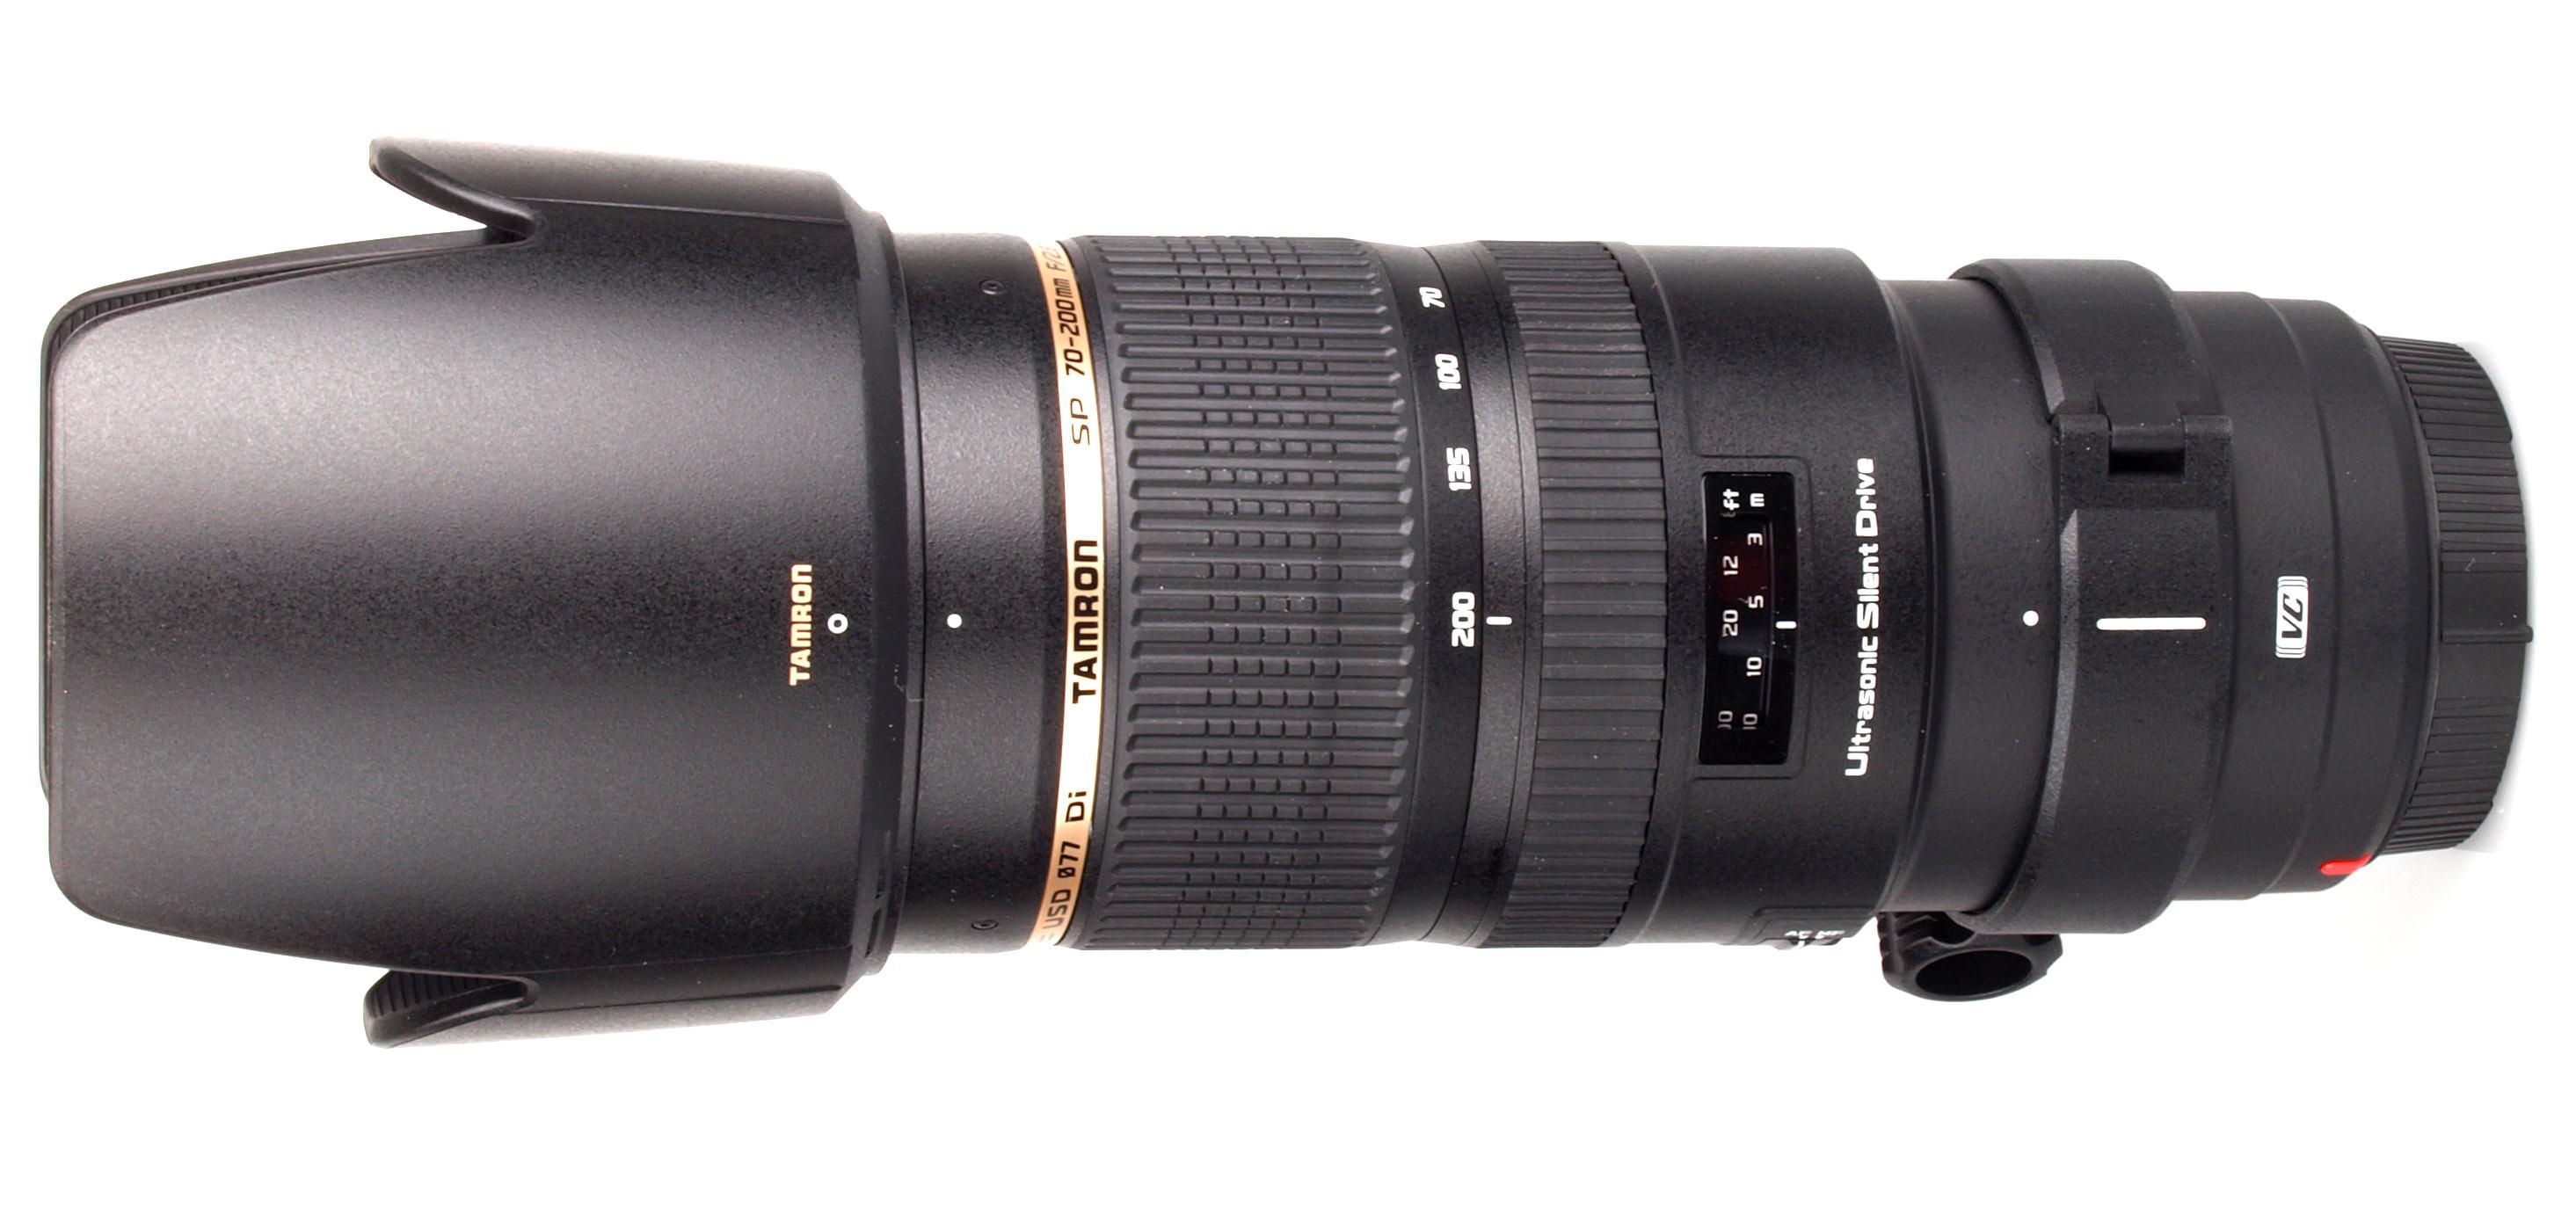 Economic Research Tamron For Nikon Sp 70 300mm F4 56 Di Vc Usd Lens